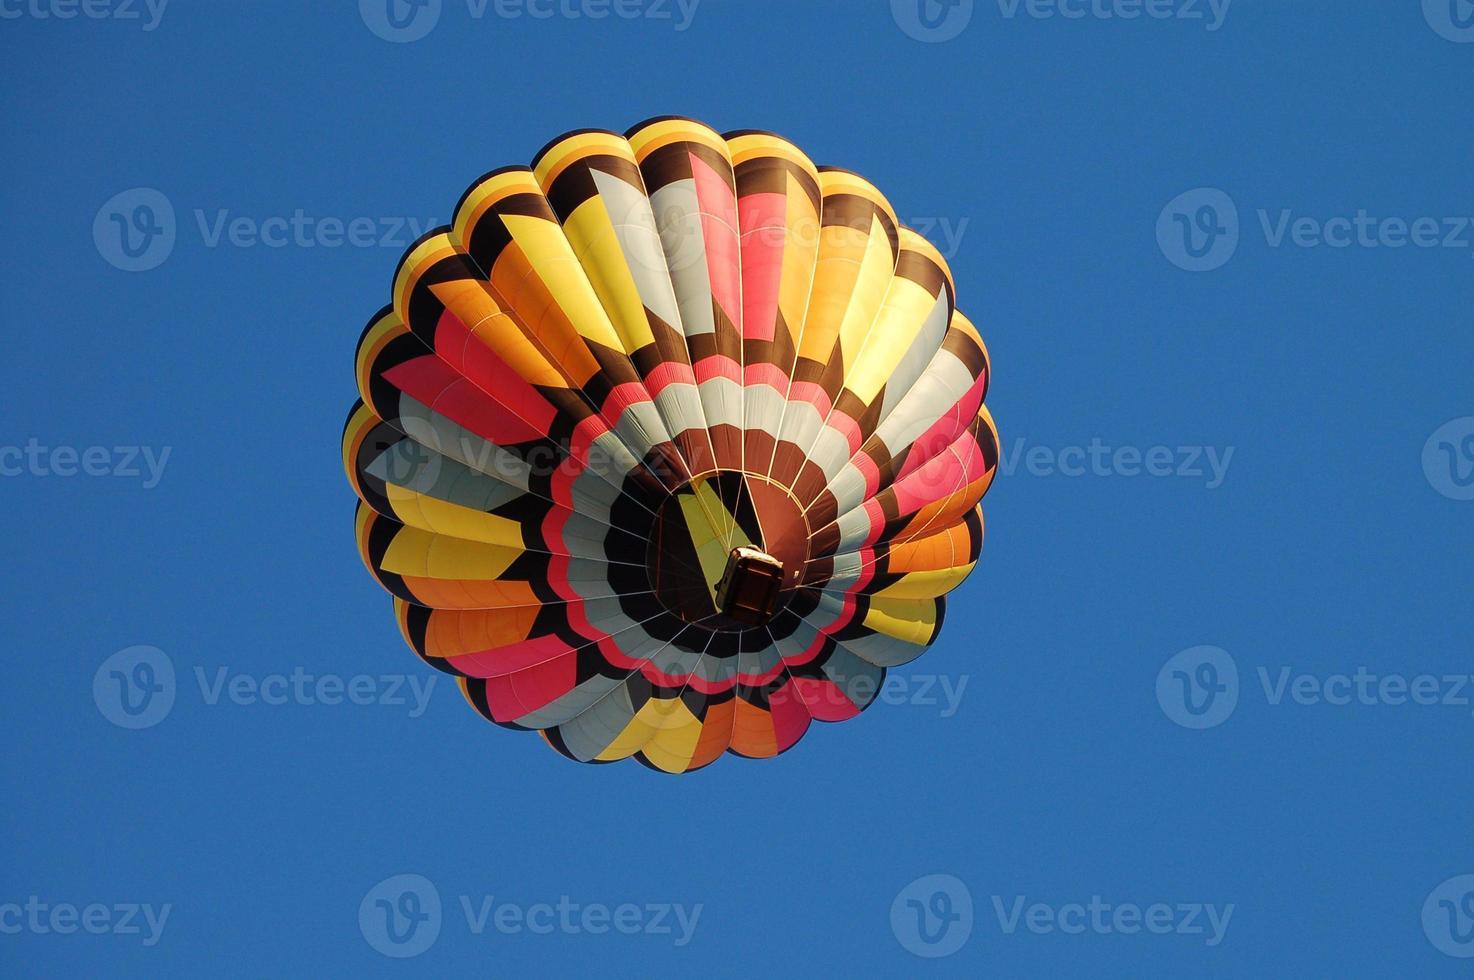 Heißluftballon-Unteransicht foto